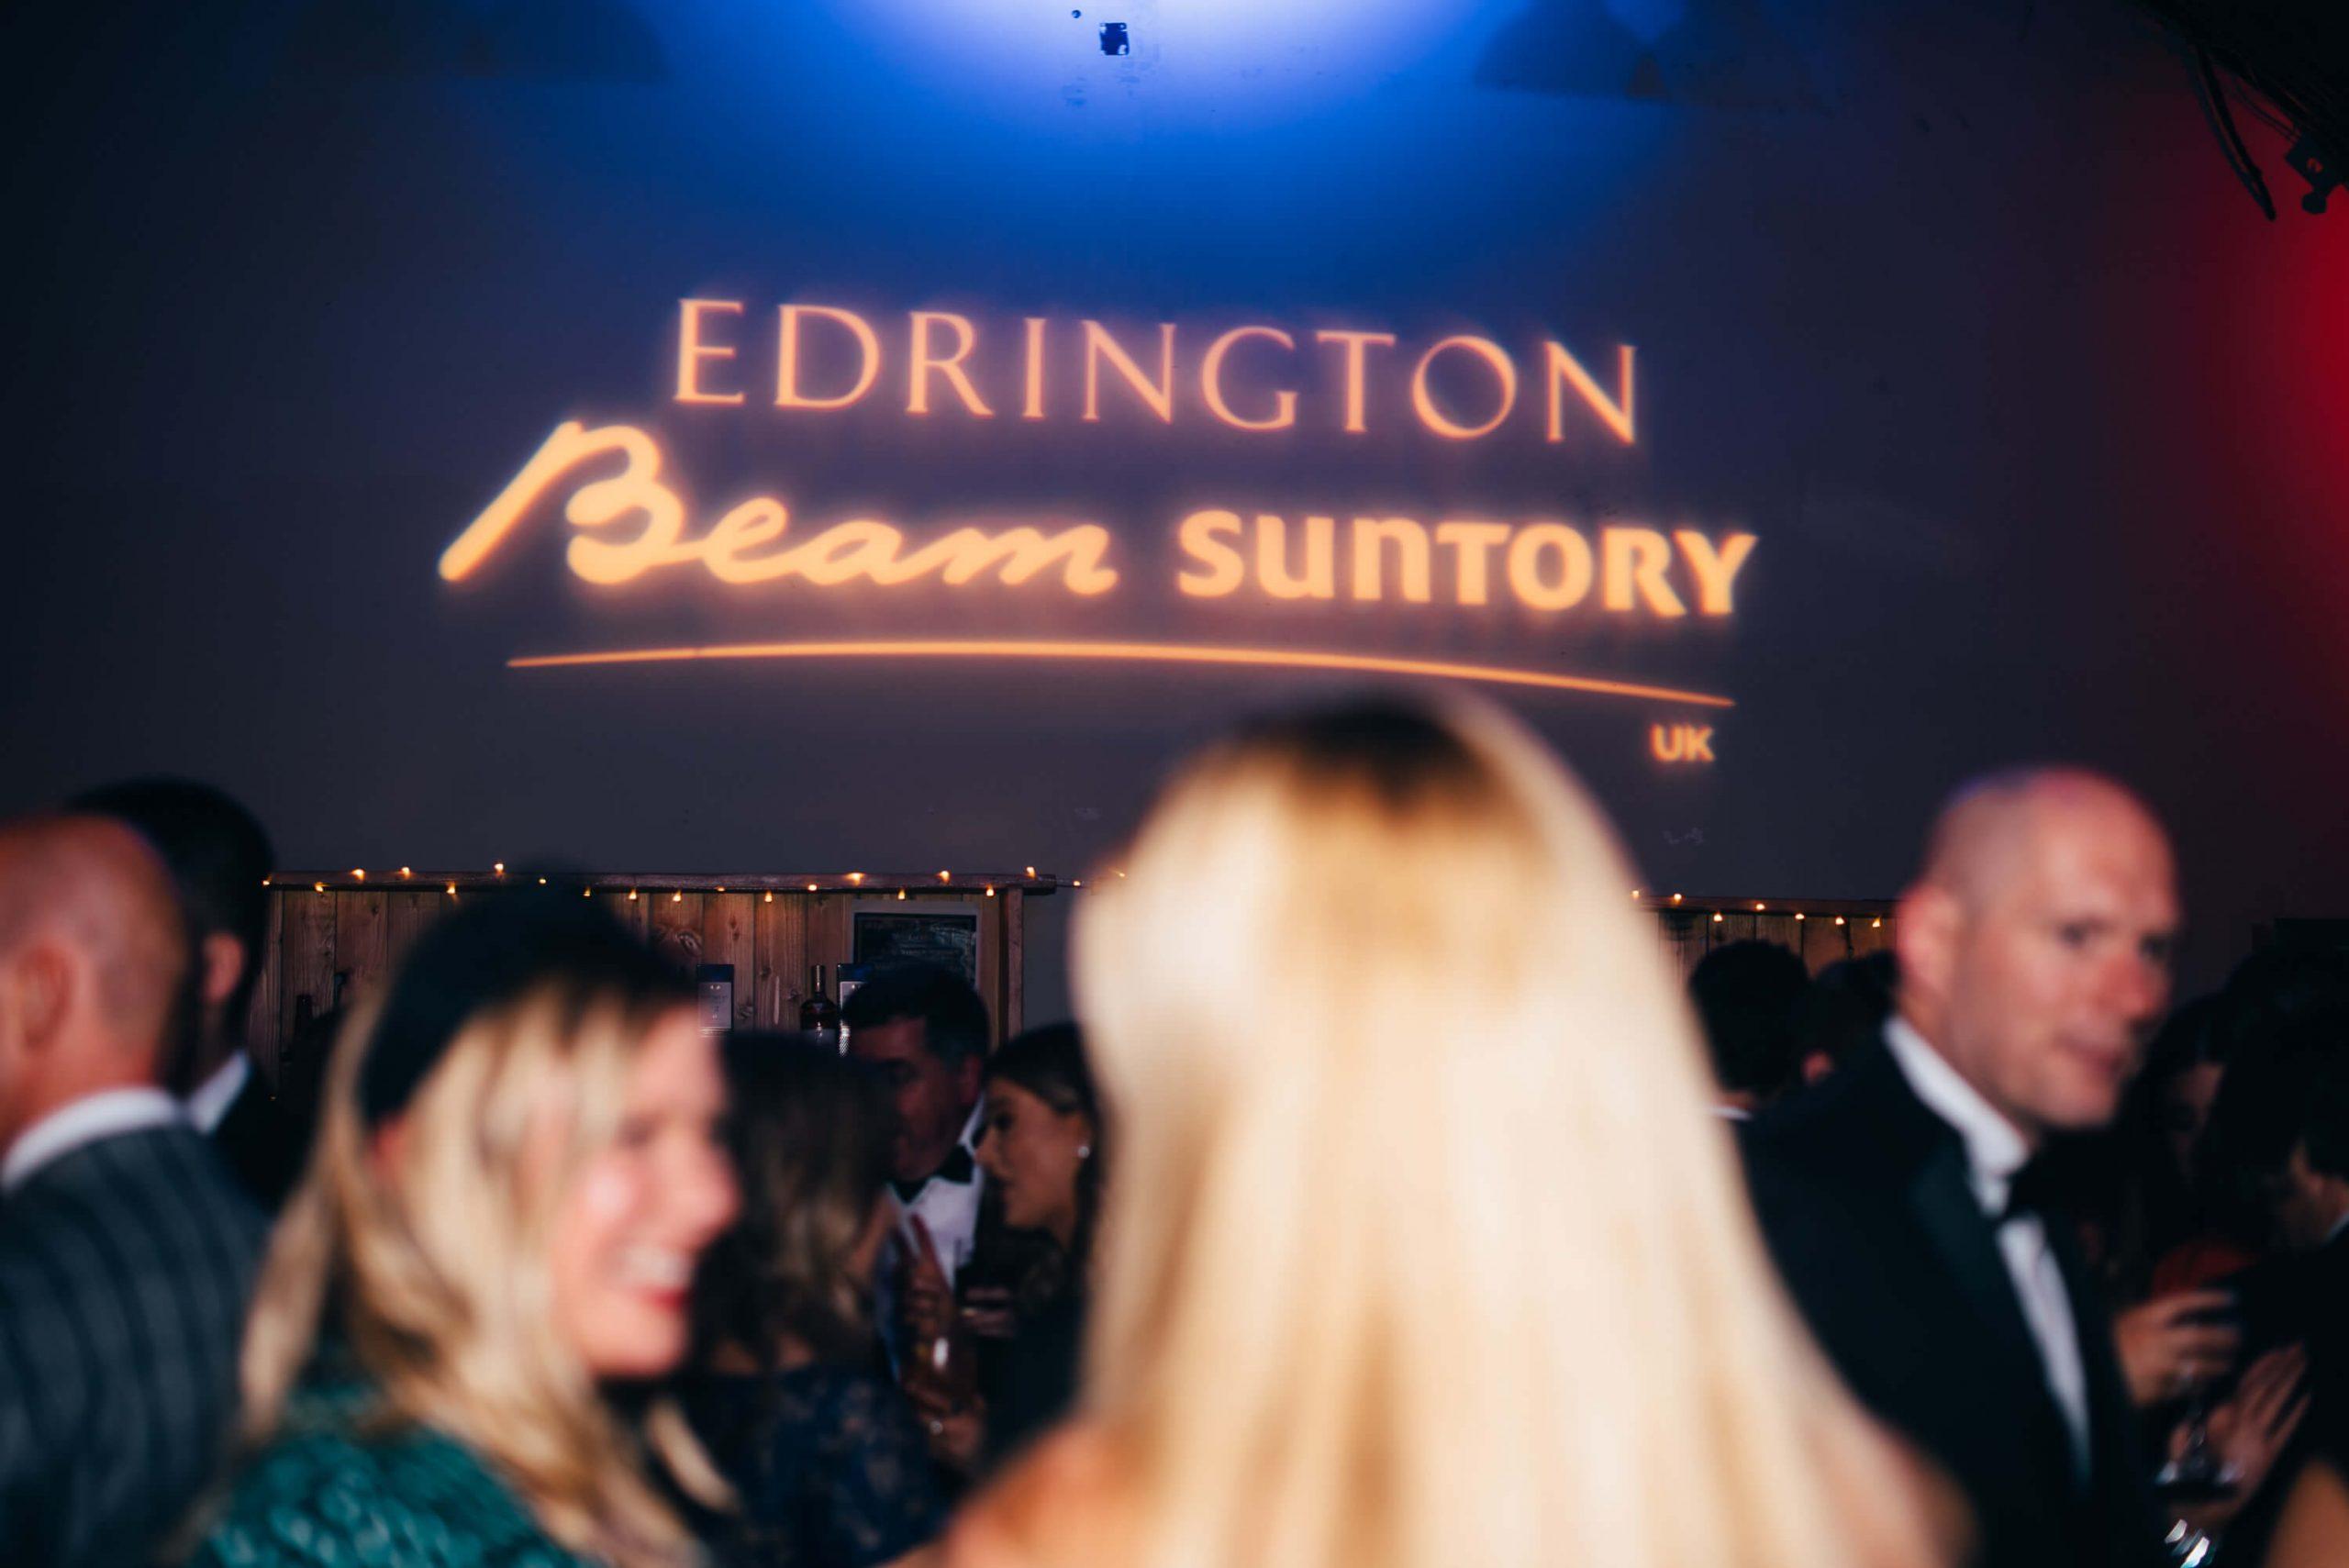 edrington_beam_suntory-mercury_awards_2019-ryanjohnstonco-66